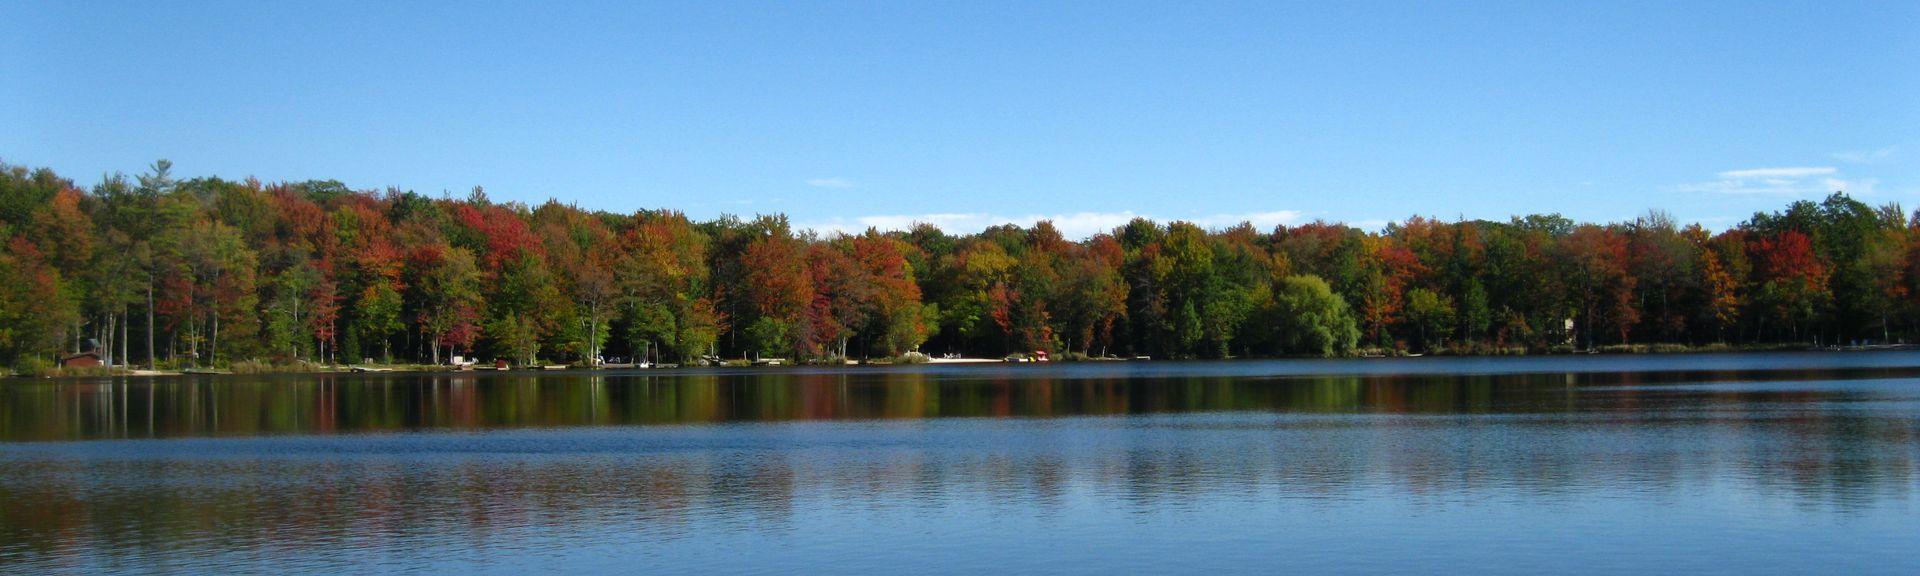 Wilkes-Barre, Pennsylvania, United States of America